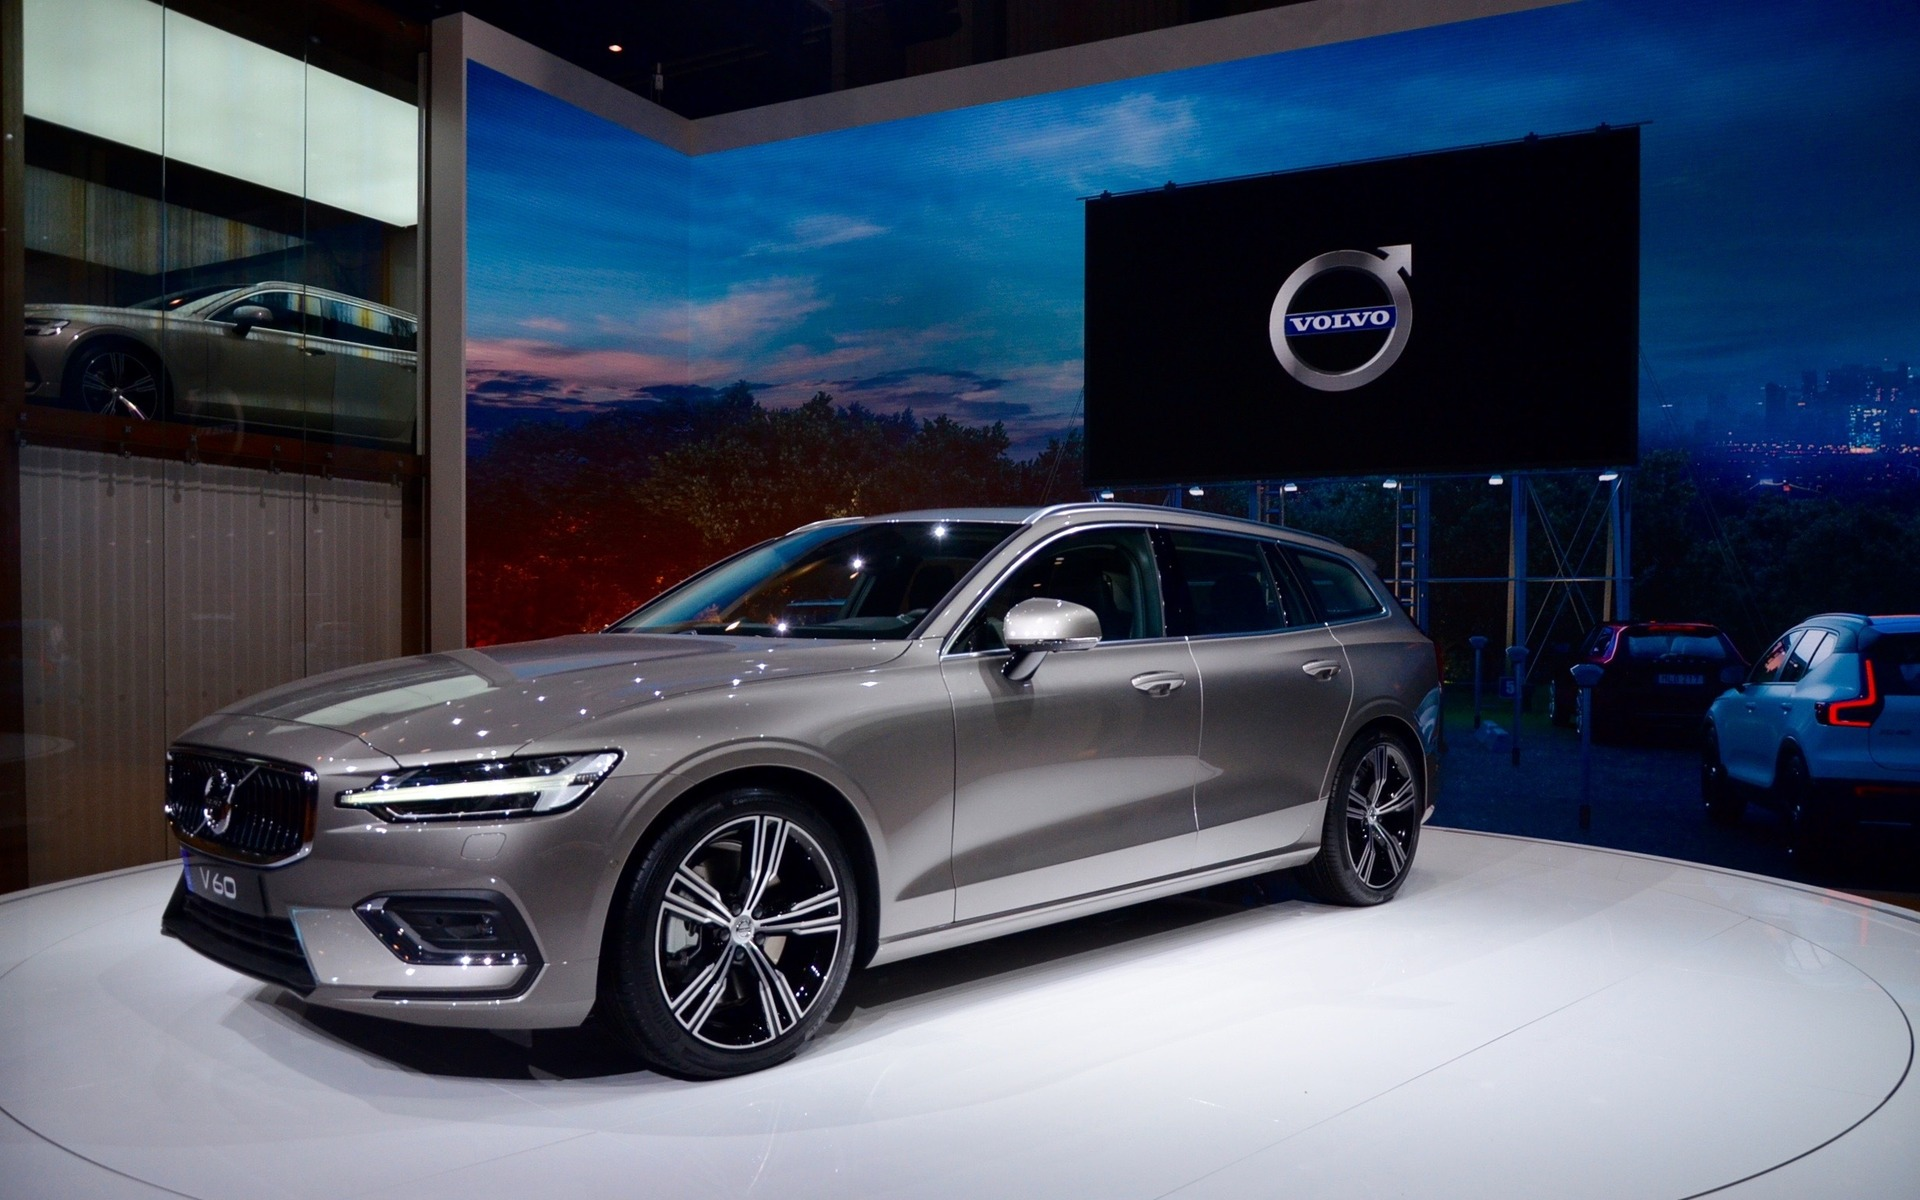 2019 Volvo V60 and 2019 Volvo XC40 Inscription North American Premieres in  New York